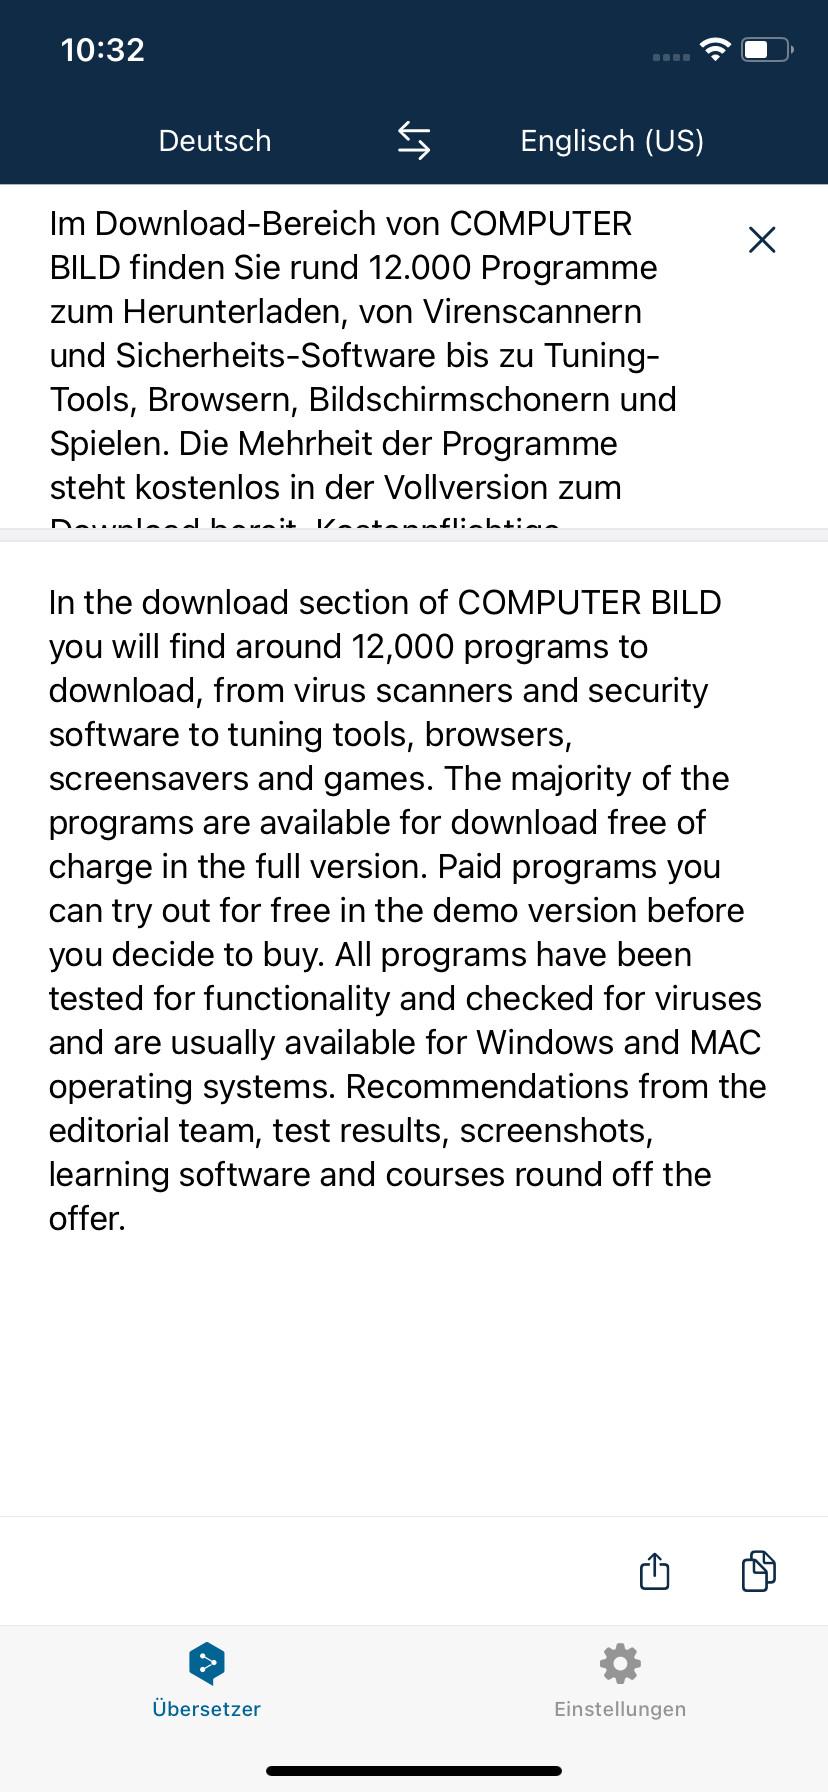 Screenshot 1 - DeepL (App für iPhone & iPad)